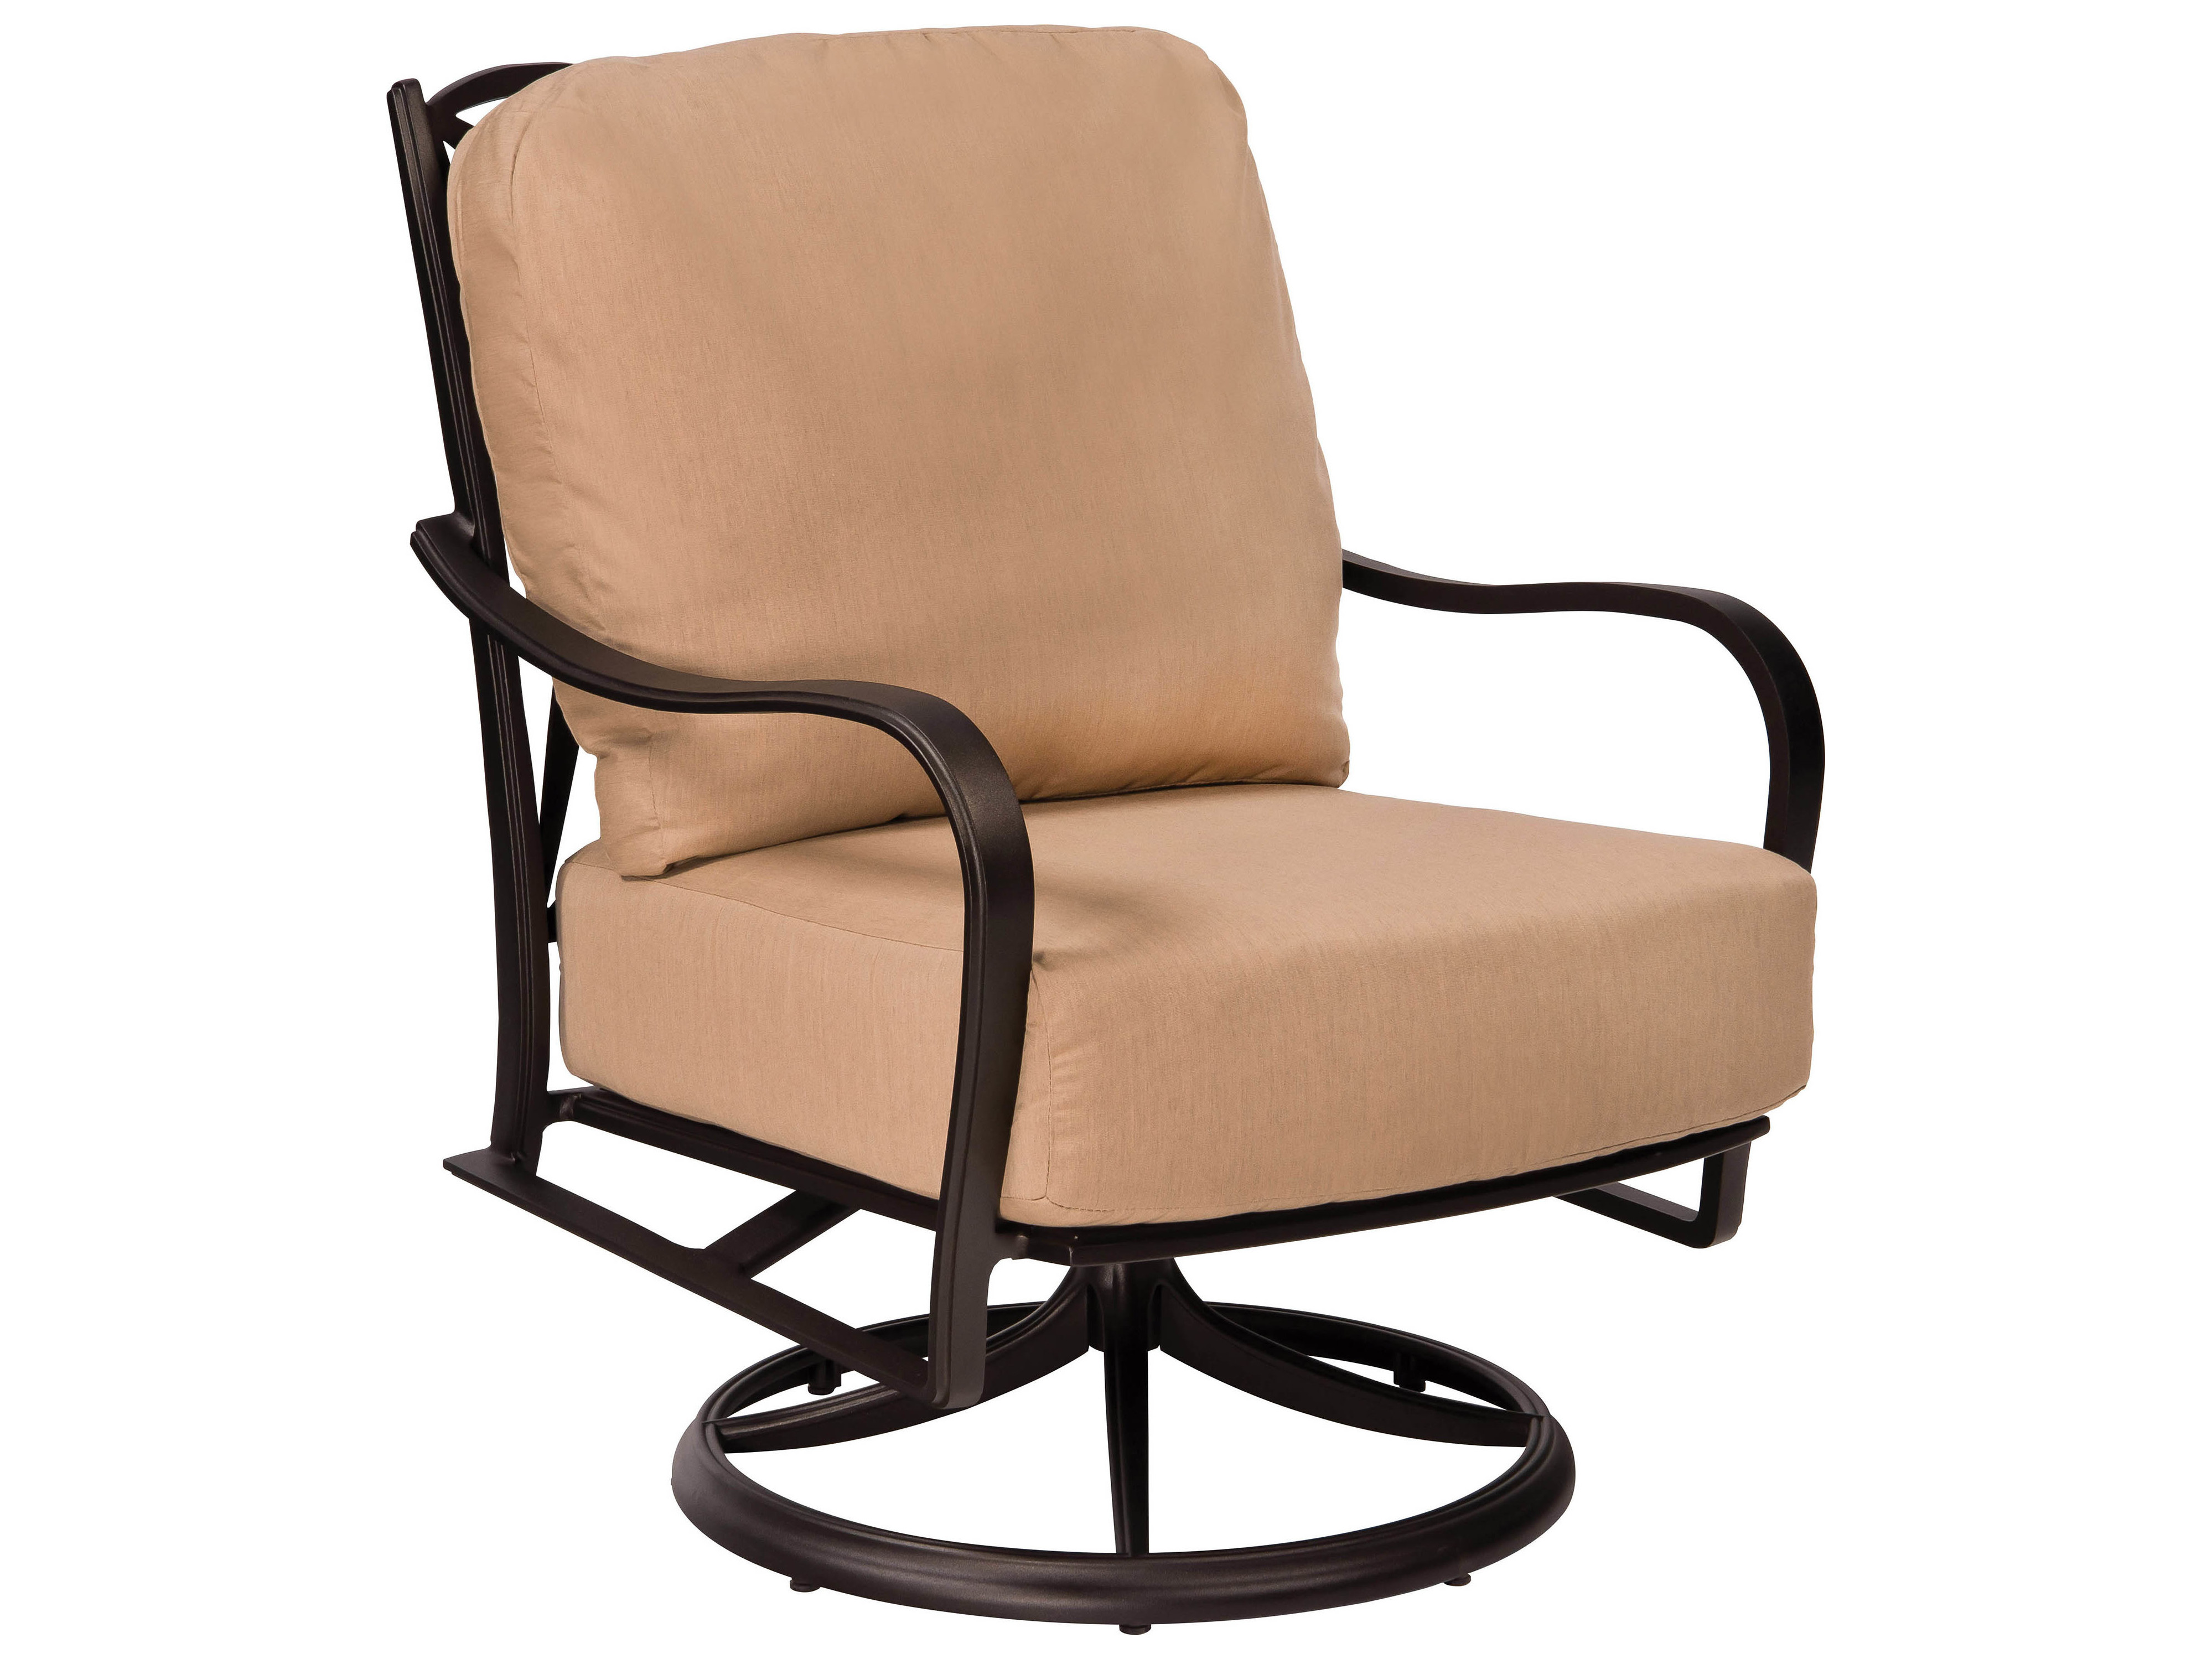 Woodard Apollo Cast Aluminum Swivel Rocker Lounge Chair 7u0477